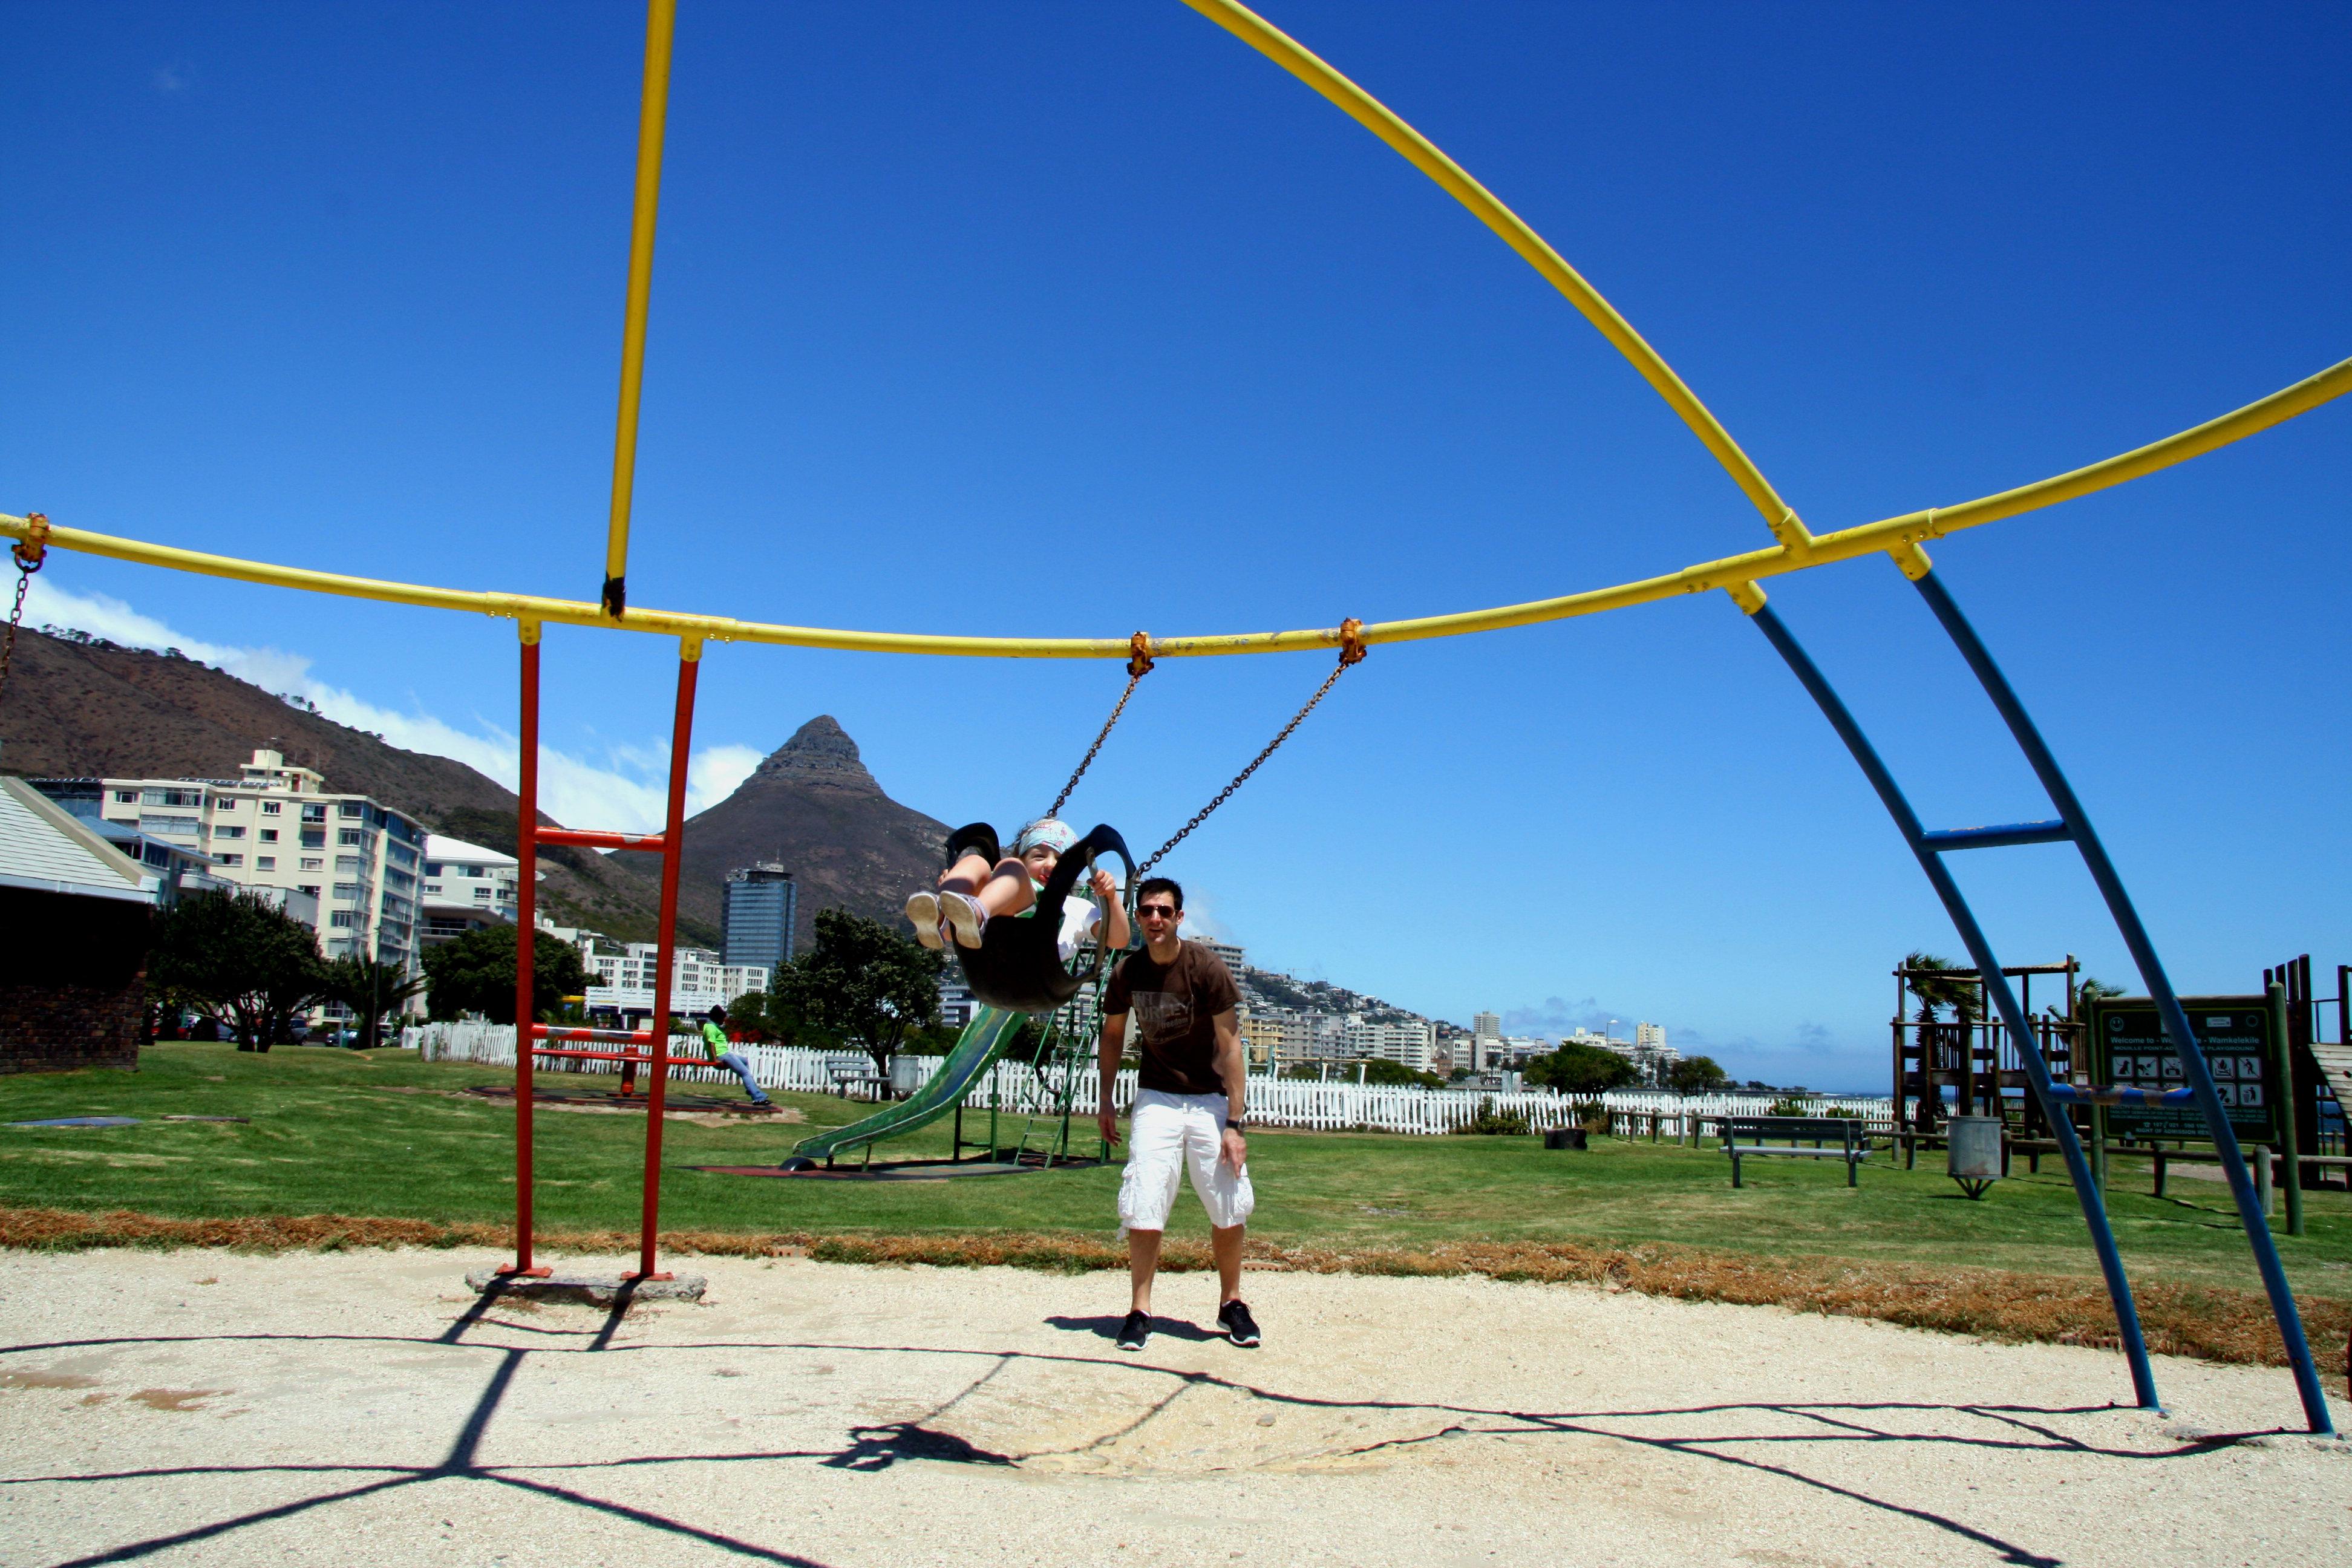 Kapstadt_Seapoint-Promenade-Playground